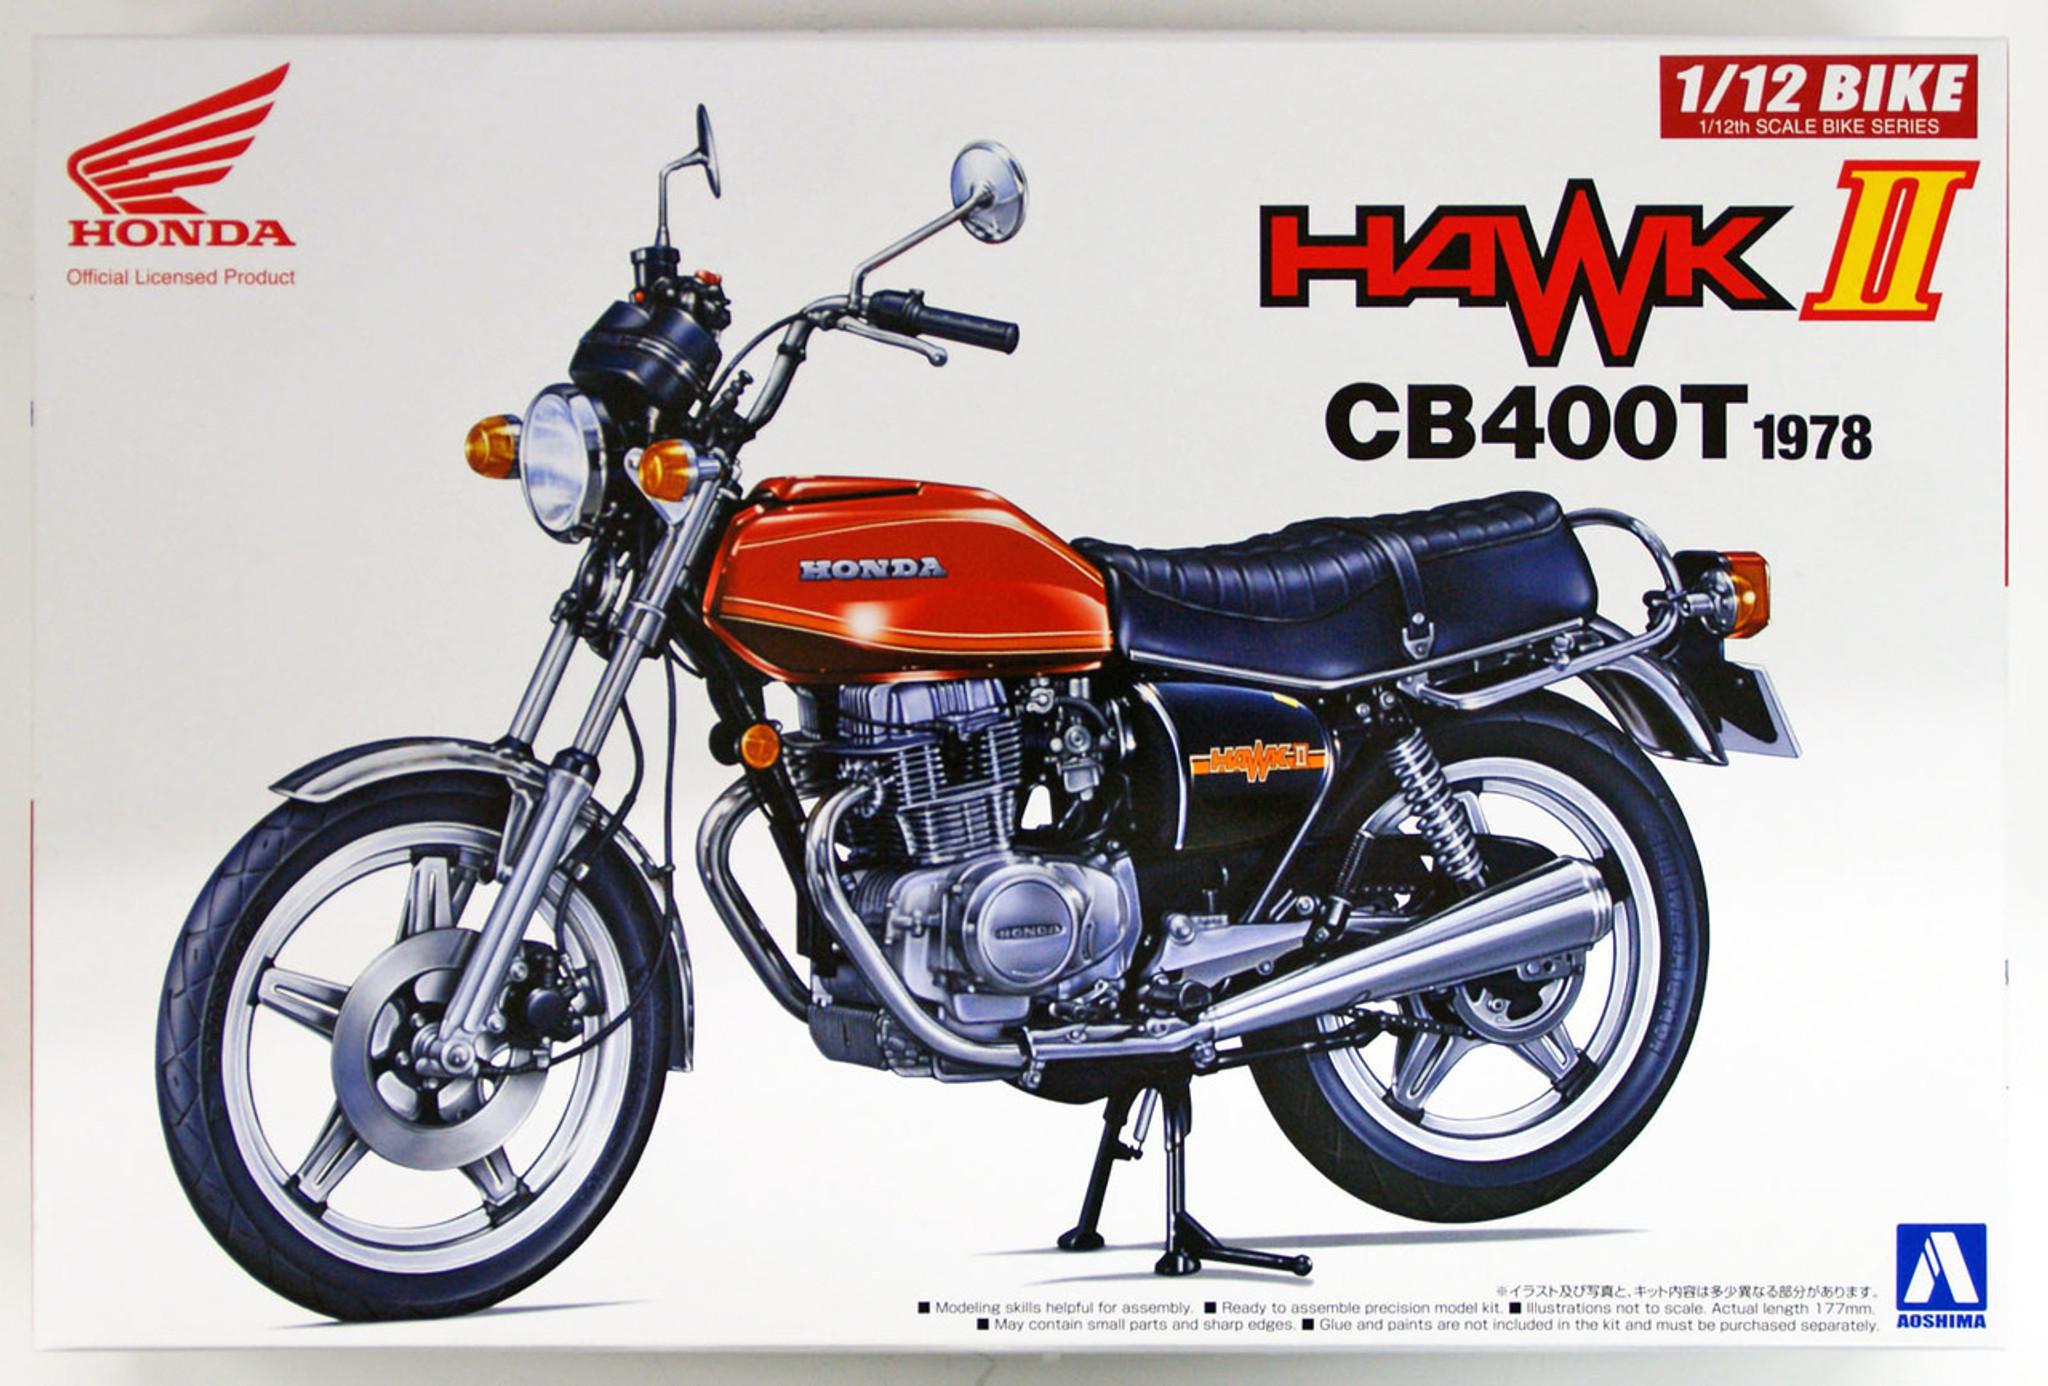 aoshima 53966 bike 42 honda hawk ii cb400t 1 12 scale kit  [ 1280 x 866 Pixel ]